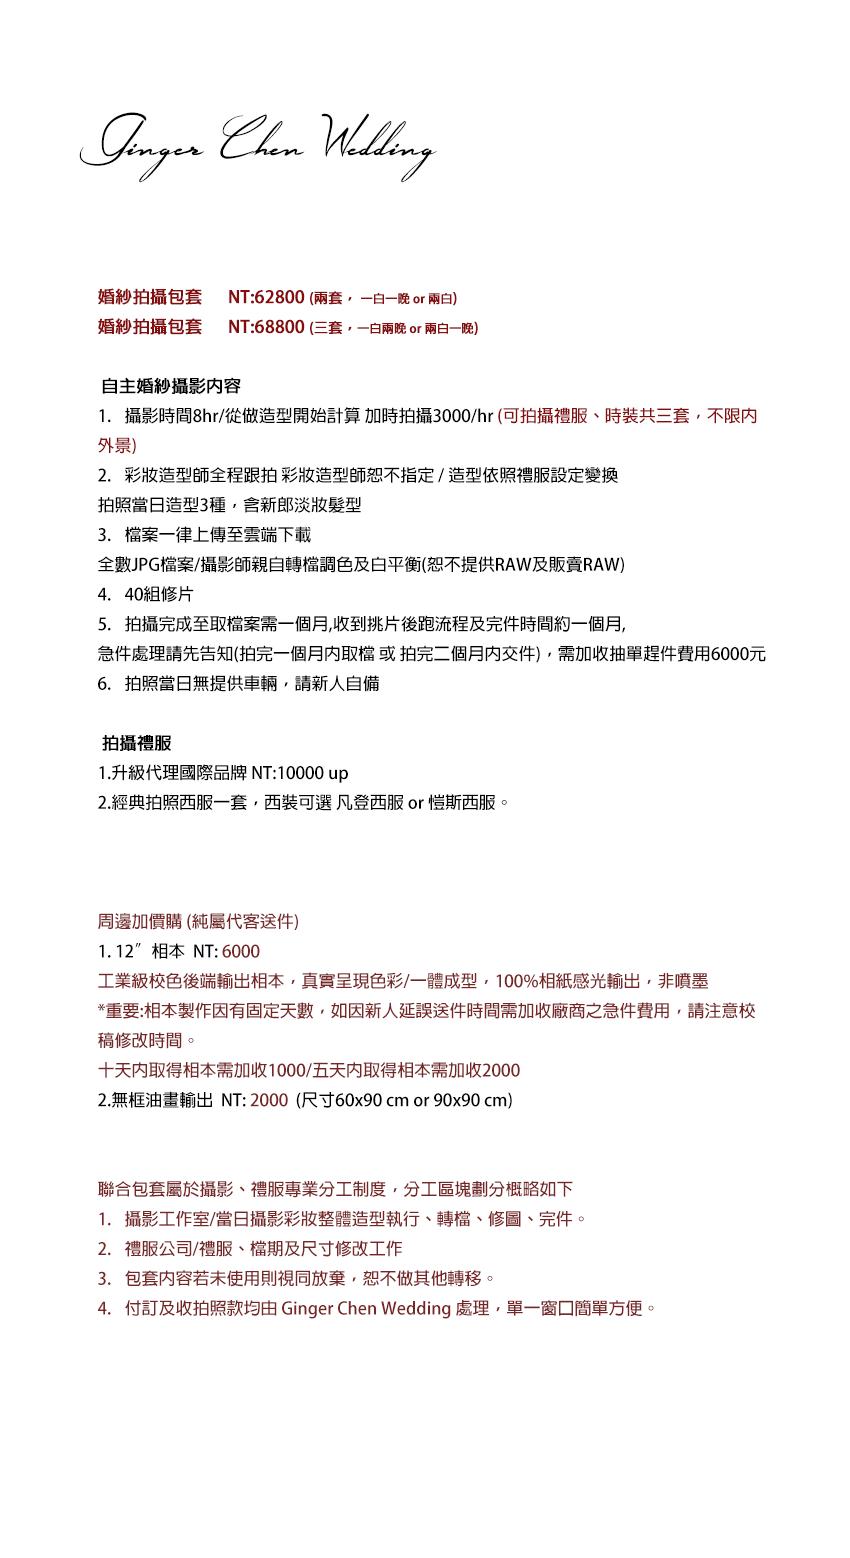 Ginger Chen Wedding 靖妝 手工訂製禮服.png